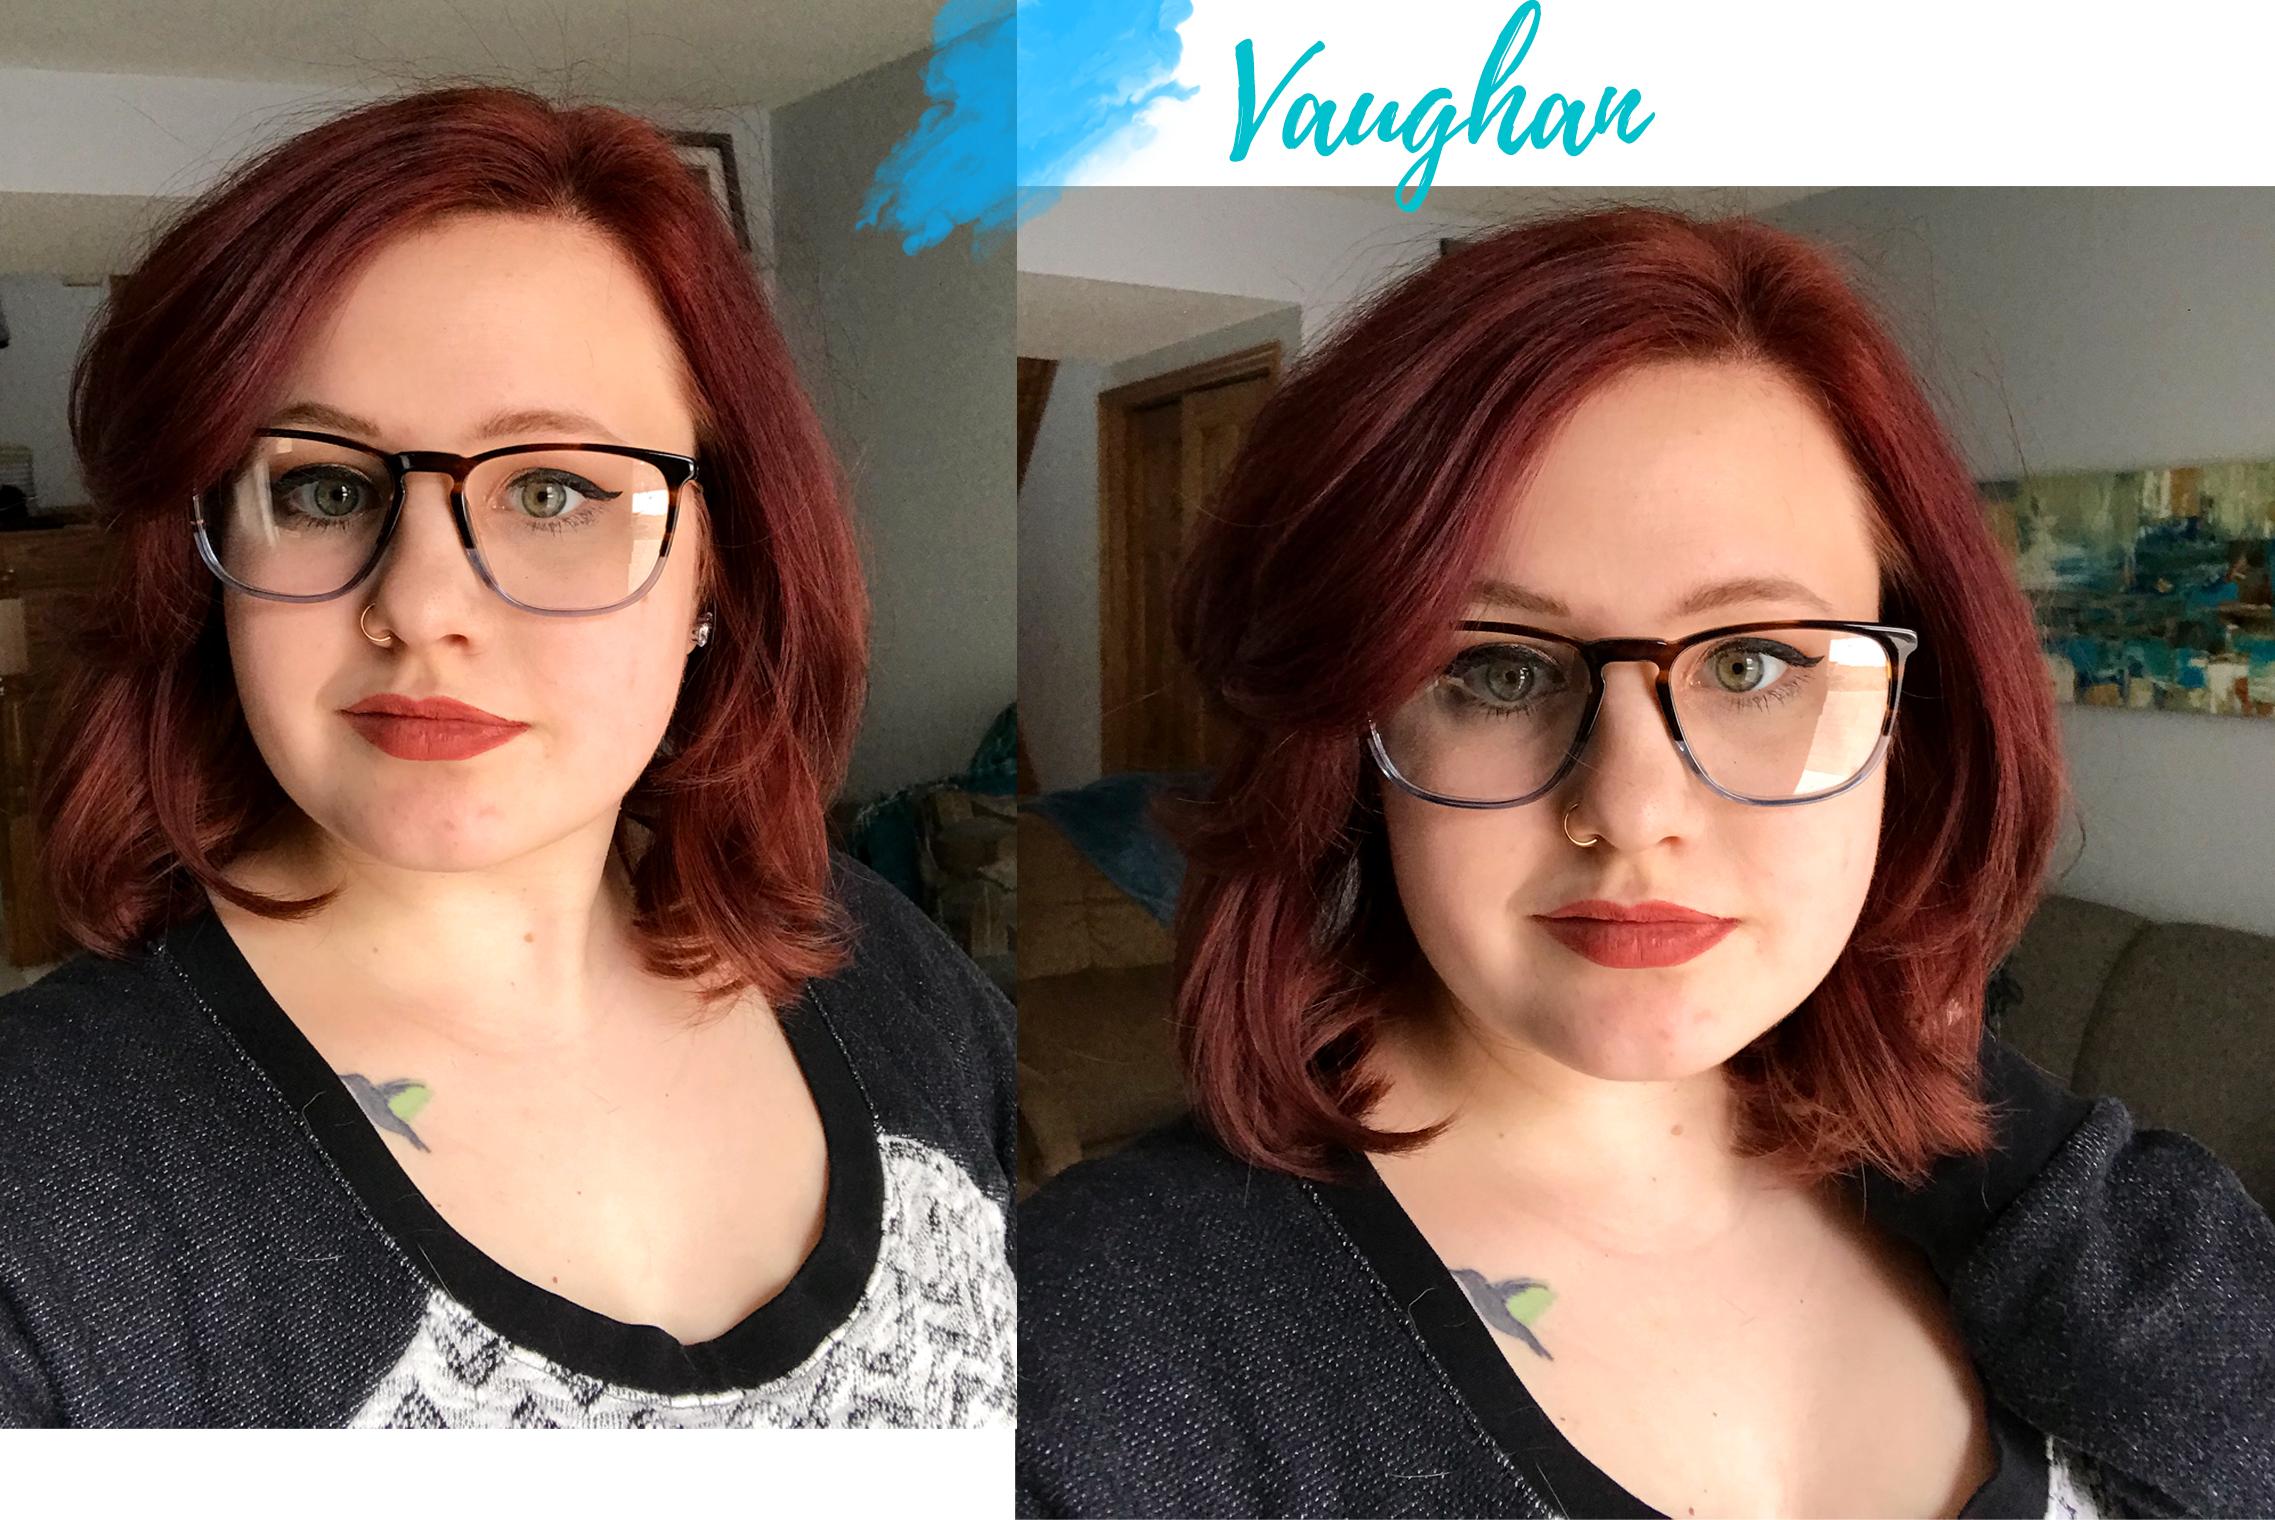 Warby Parker Vaughan glasses